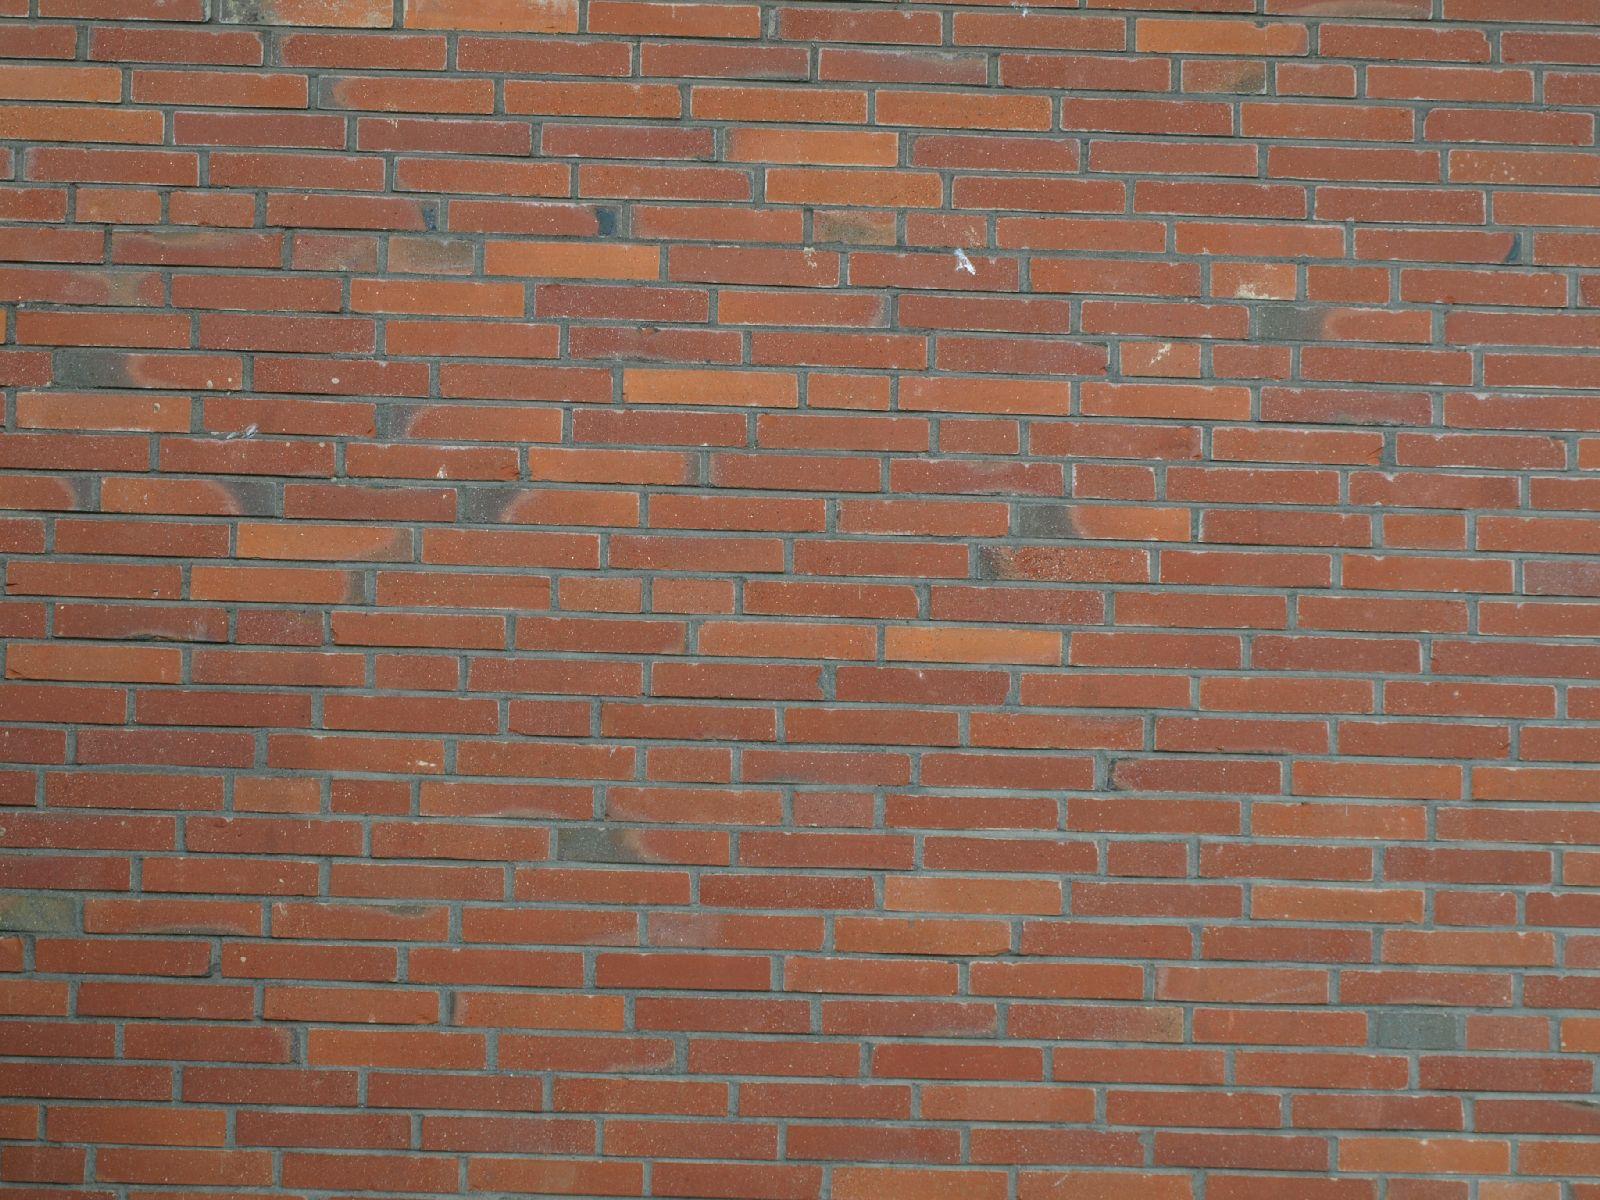 Brick_Texture_A_PC238033